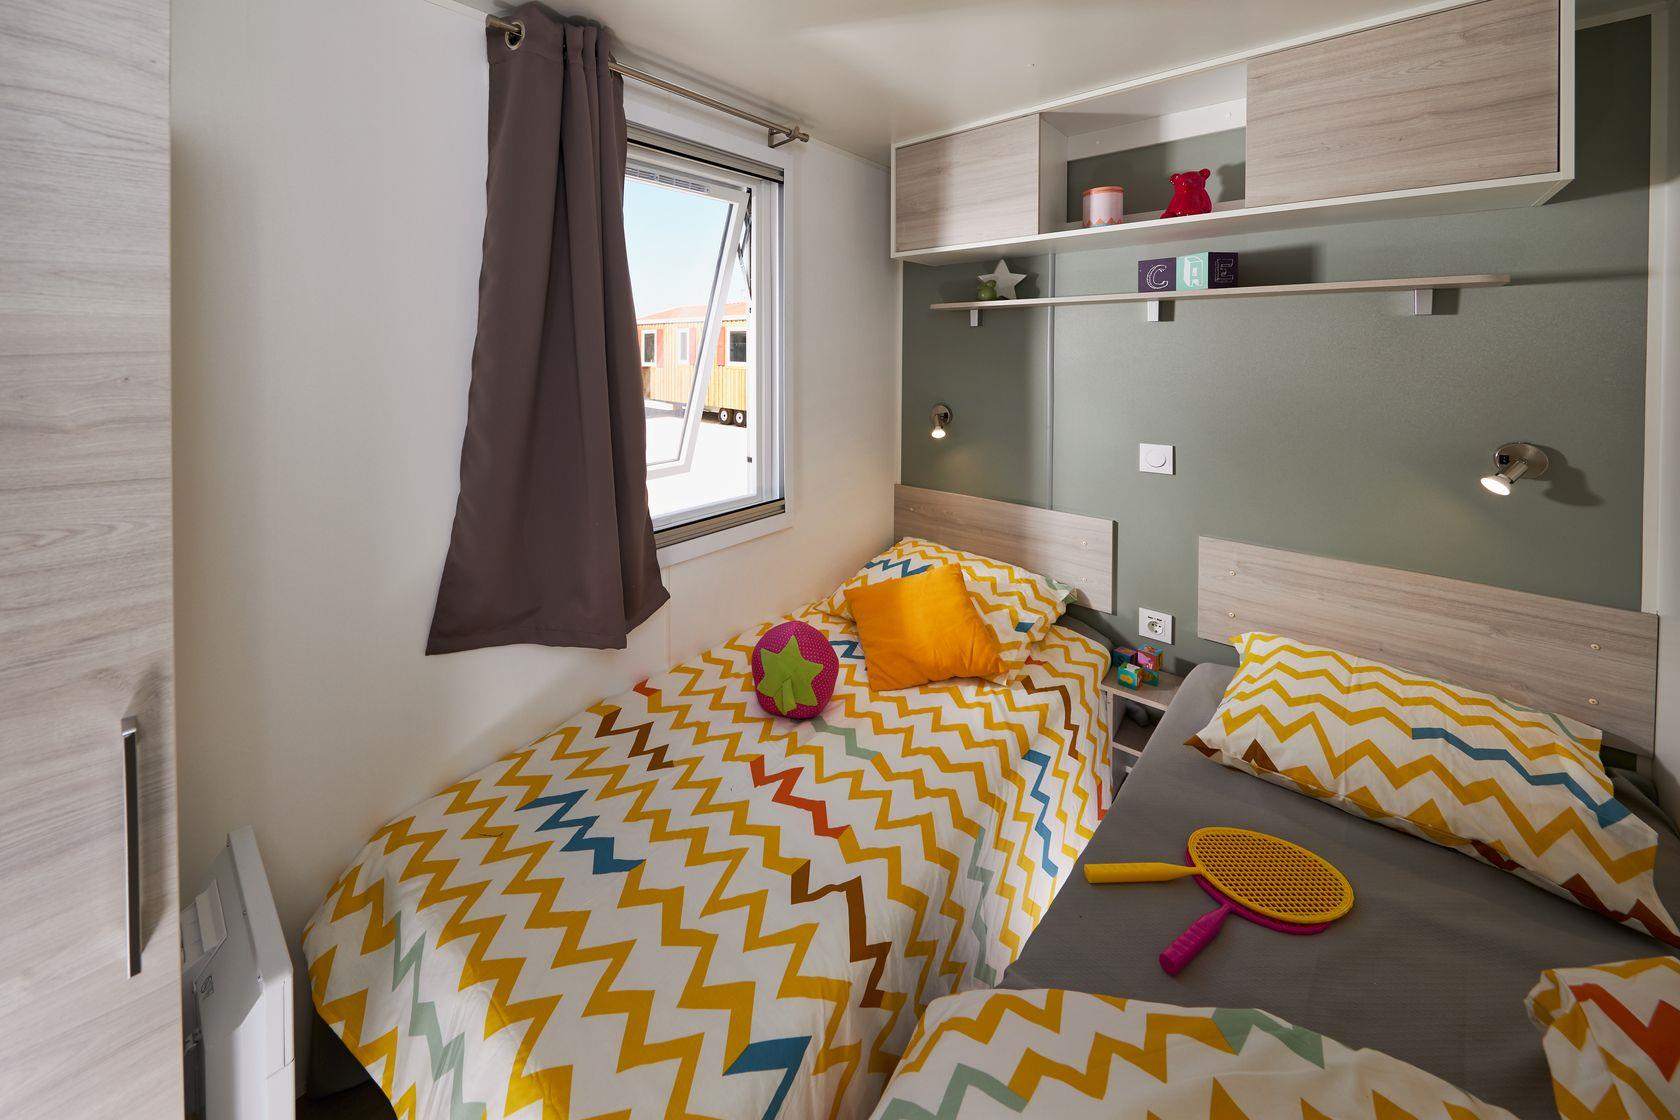 Camping-monte-ortu-new-mobile-homeslaapkamer